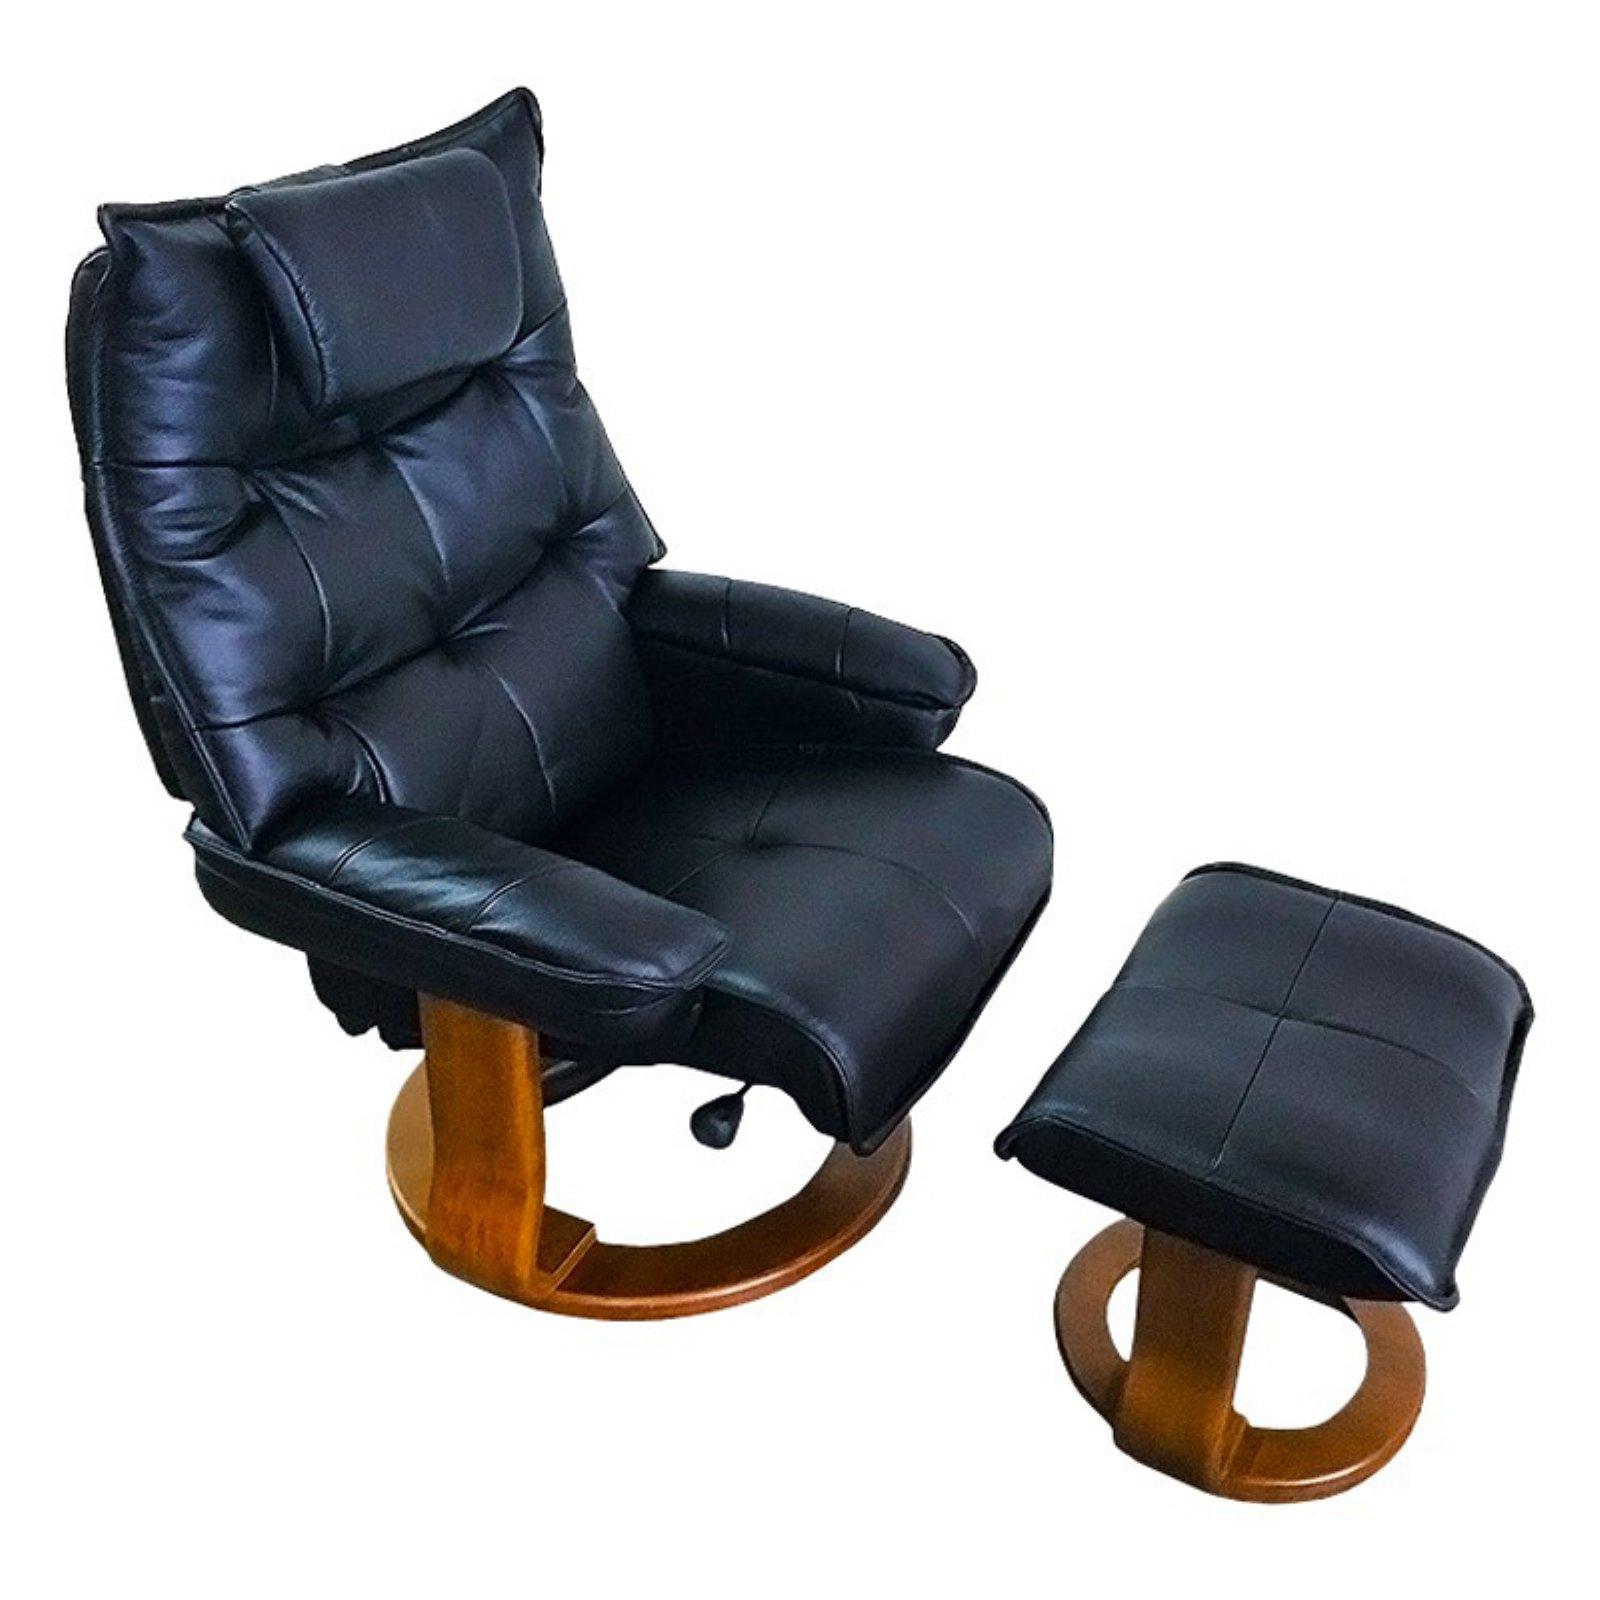 World Source Design Hana Leather Recliner And Ottoman Black